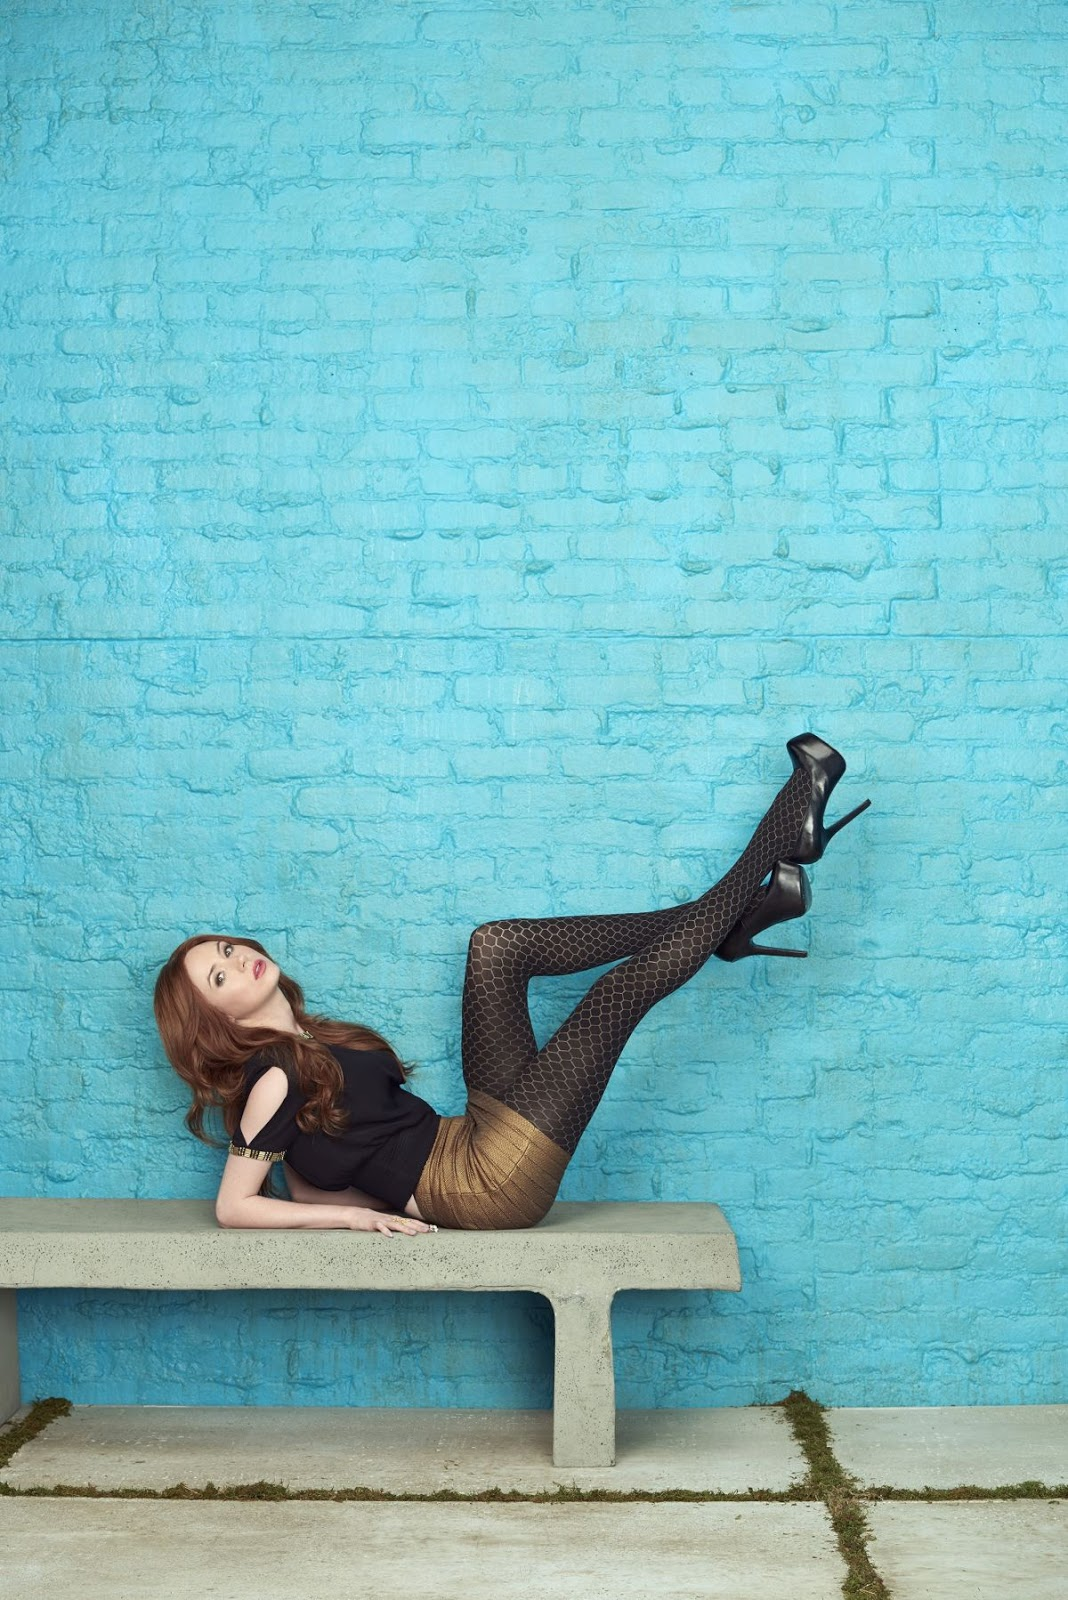 HQ Wallpapers of 'Guardians of The Galaxy Vol. 2' actress Karen Gillan Selfie Season 1 Promos